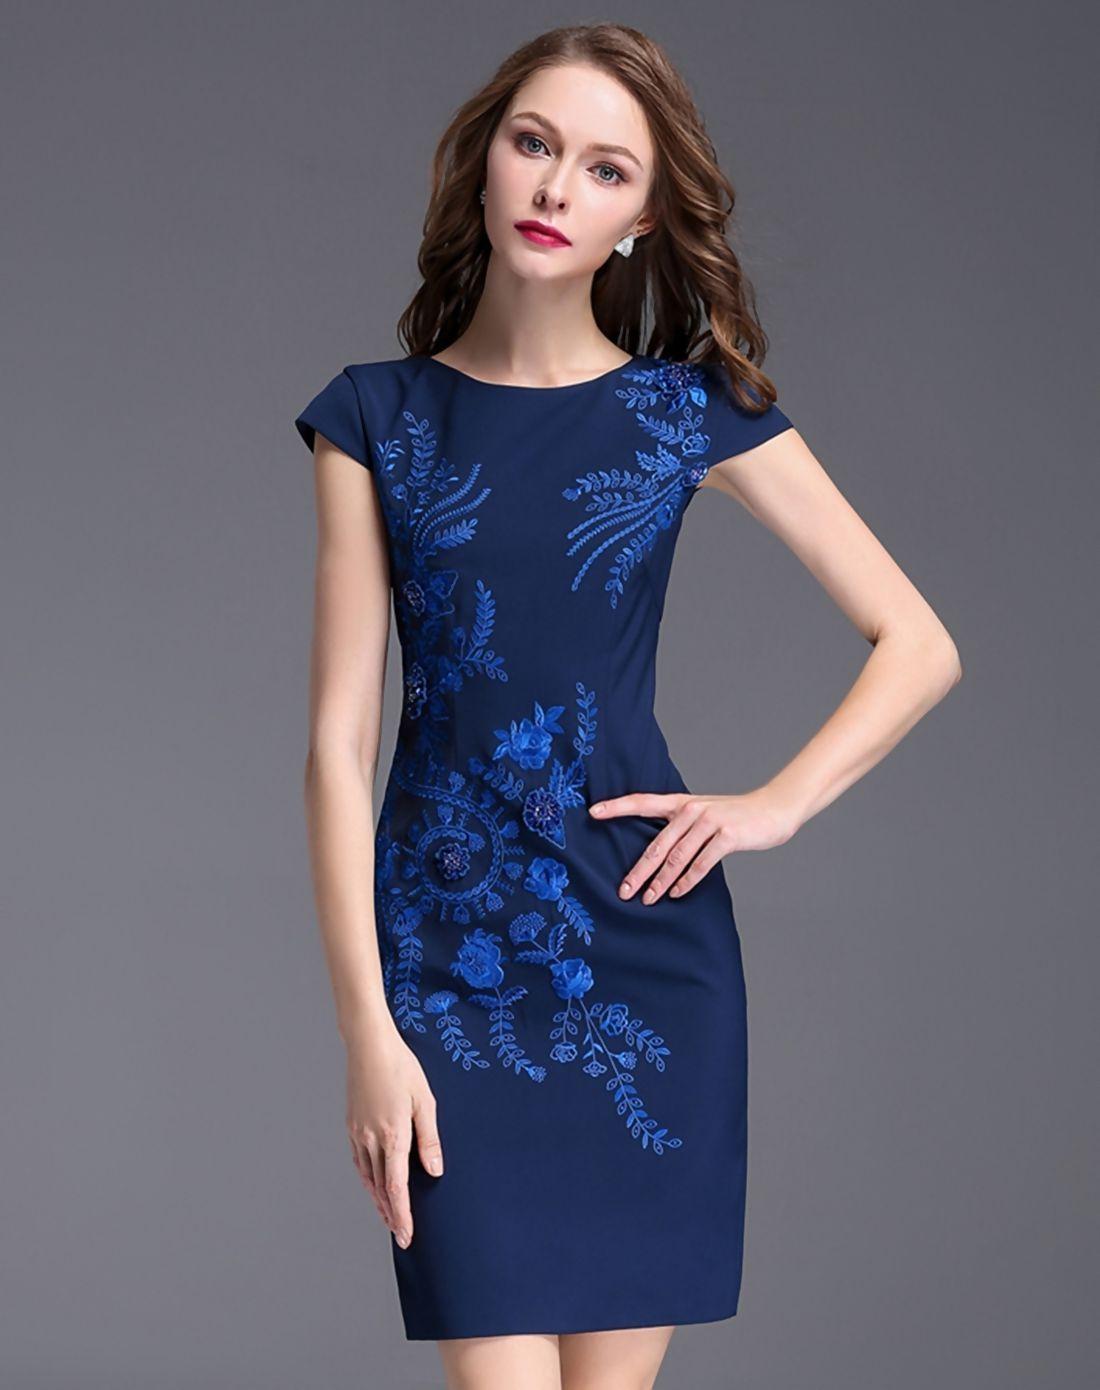 Adorewe vipme bodycon dressesdesigner yzxh royal blue beaded